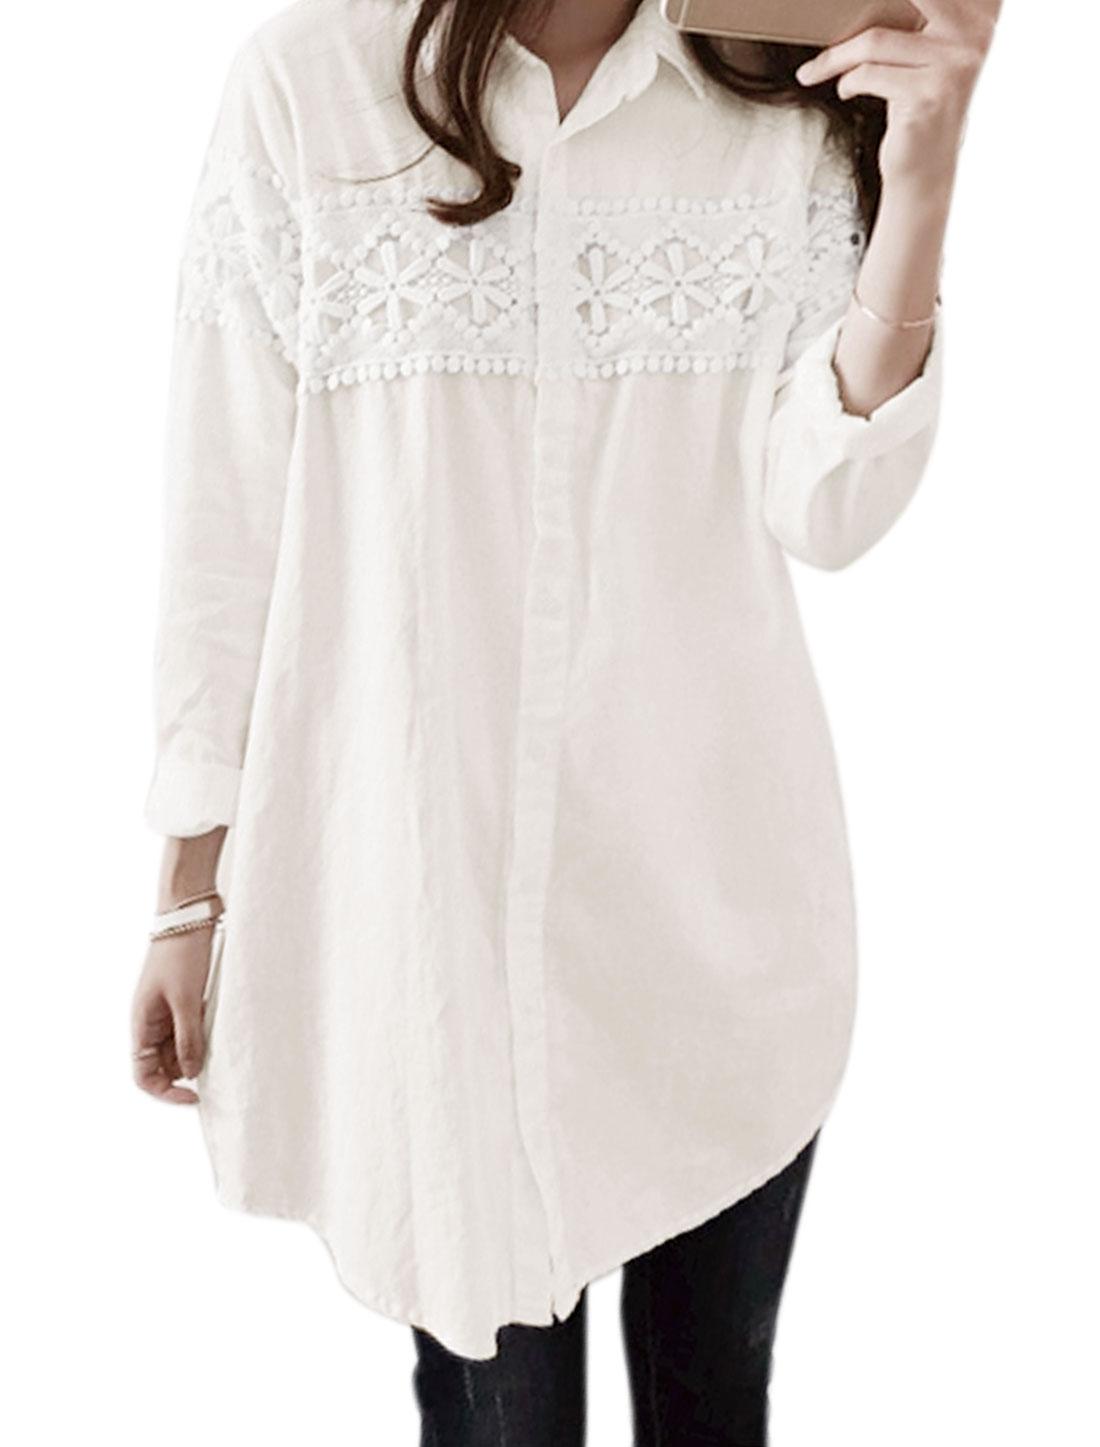 Women Long Sleeves Single Breasted Crochet Tunic Casual Shirt White M